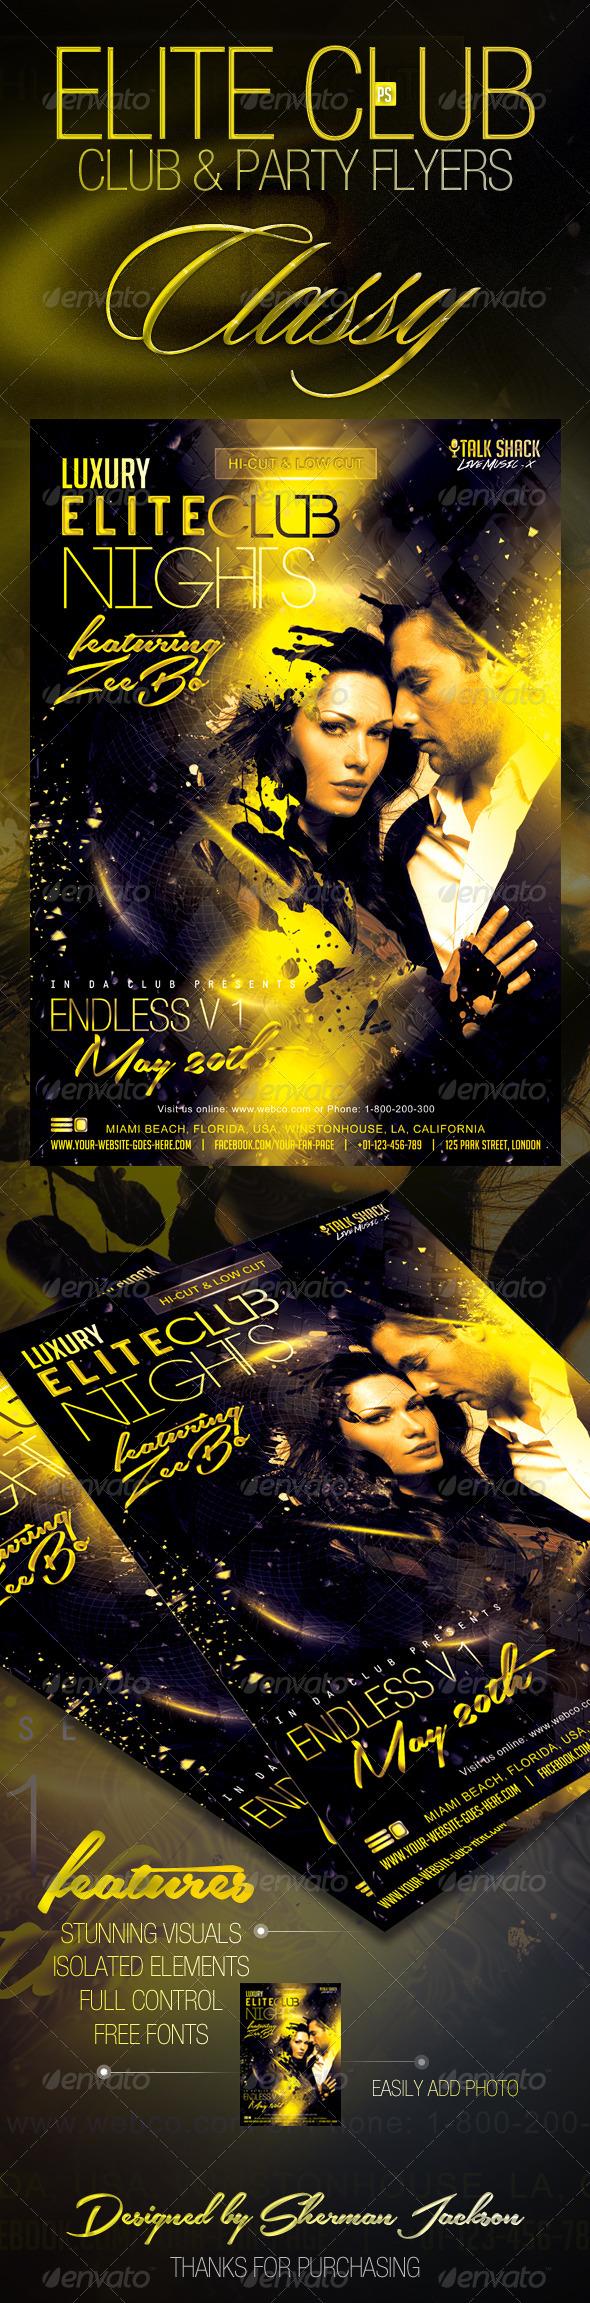 GraphicRiver Luxury Elite Club Nights Flyer 7660407